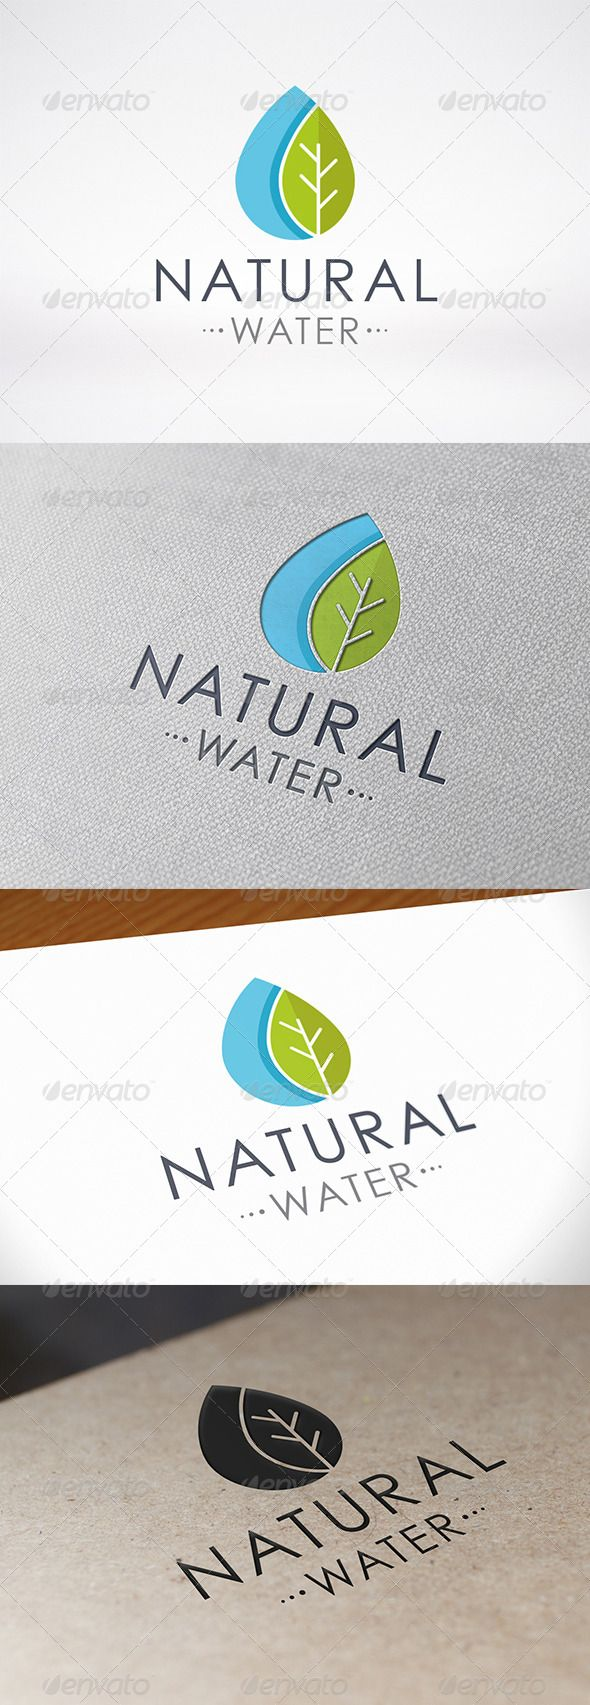 25 best ideas about logo templates on pinterest logo design